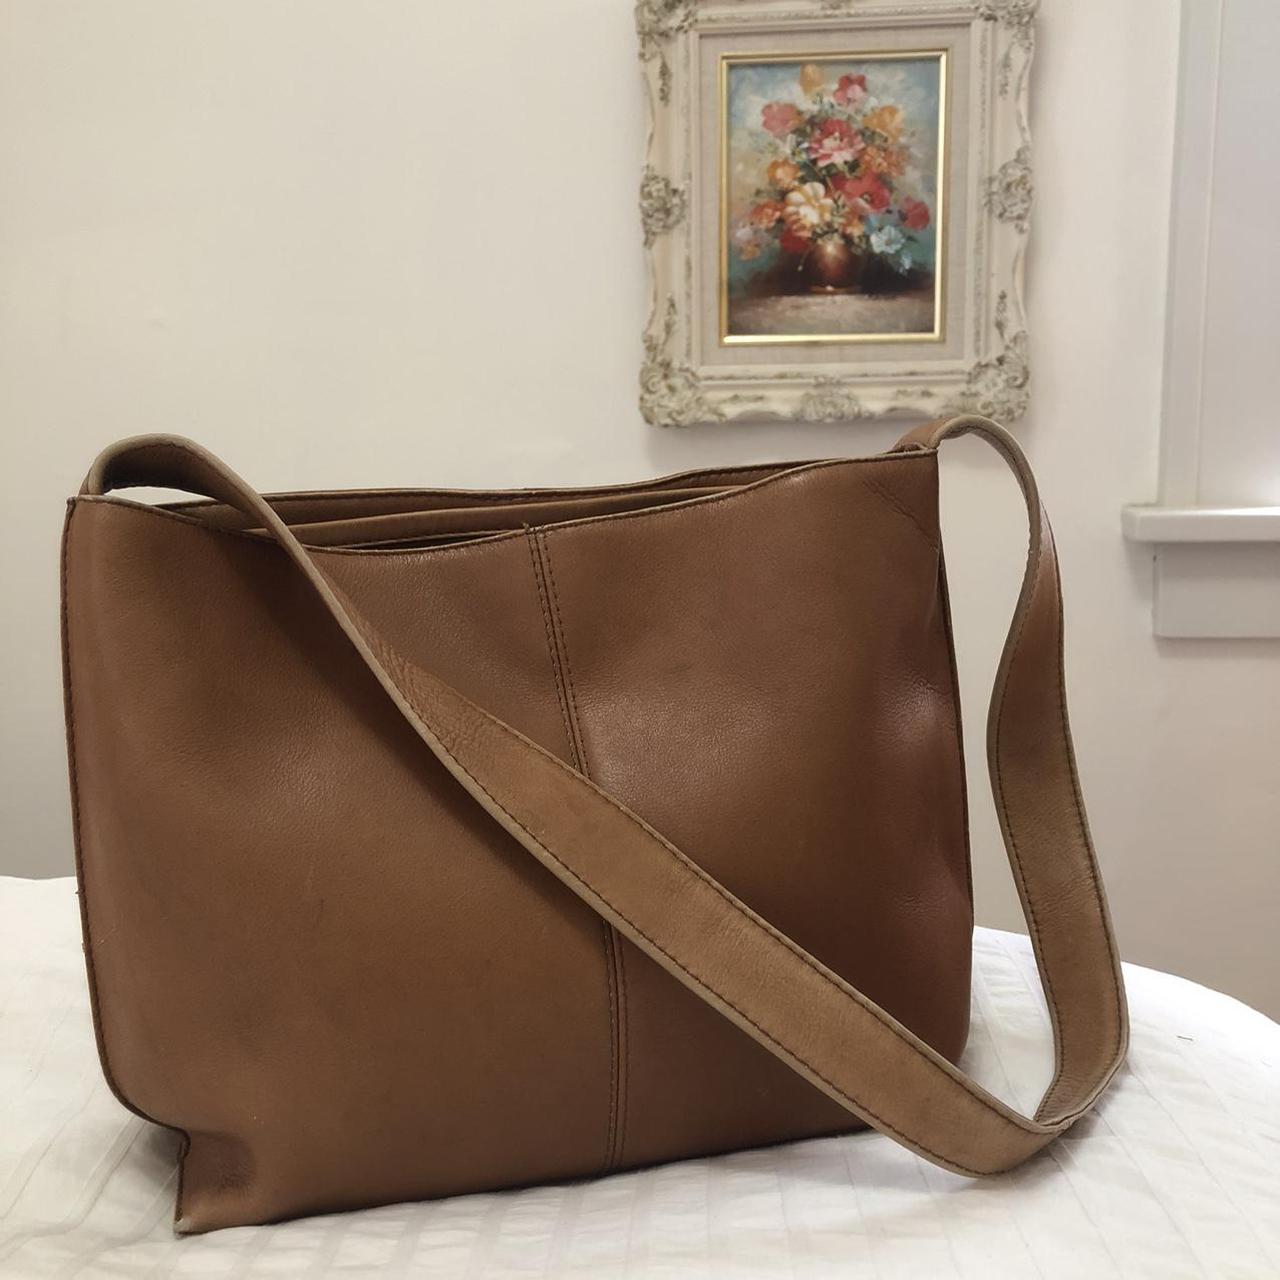 Product Image 1 - vintage brown leather hobo bag